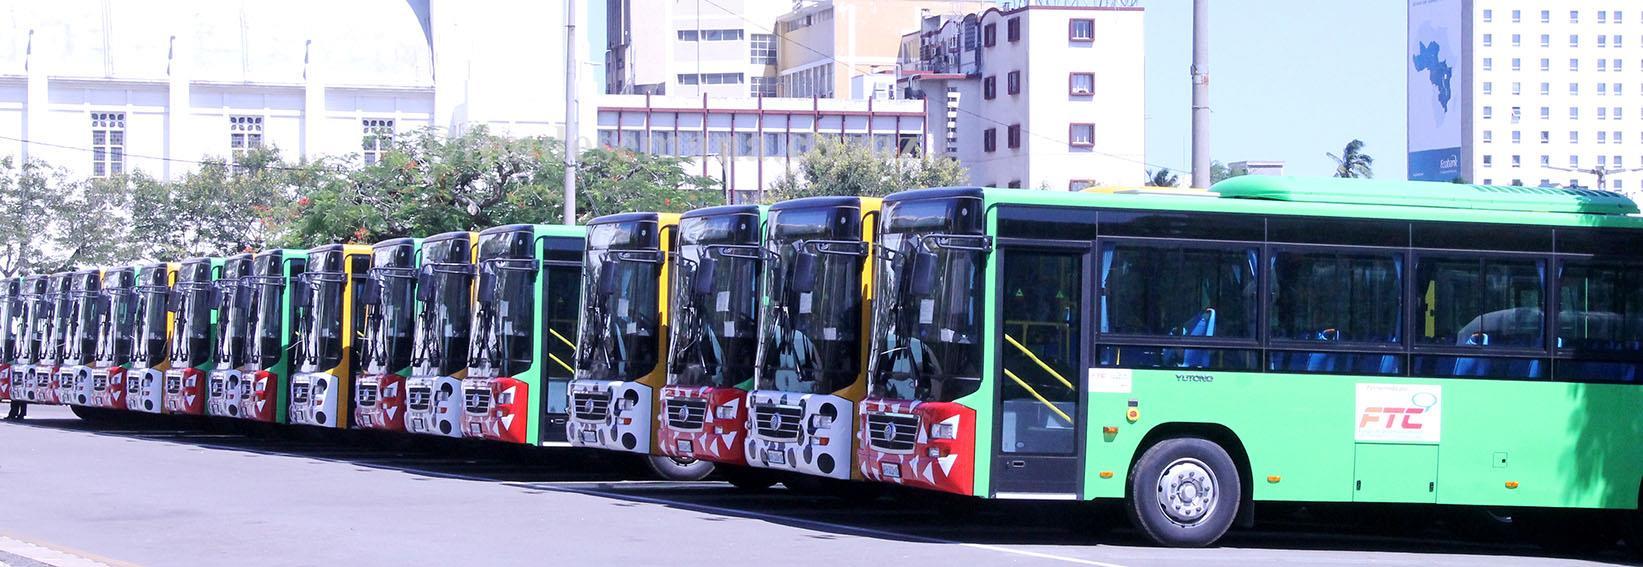 50 autocarros entregues aos operadores privados pelo MTC